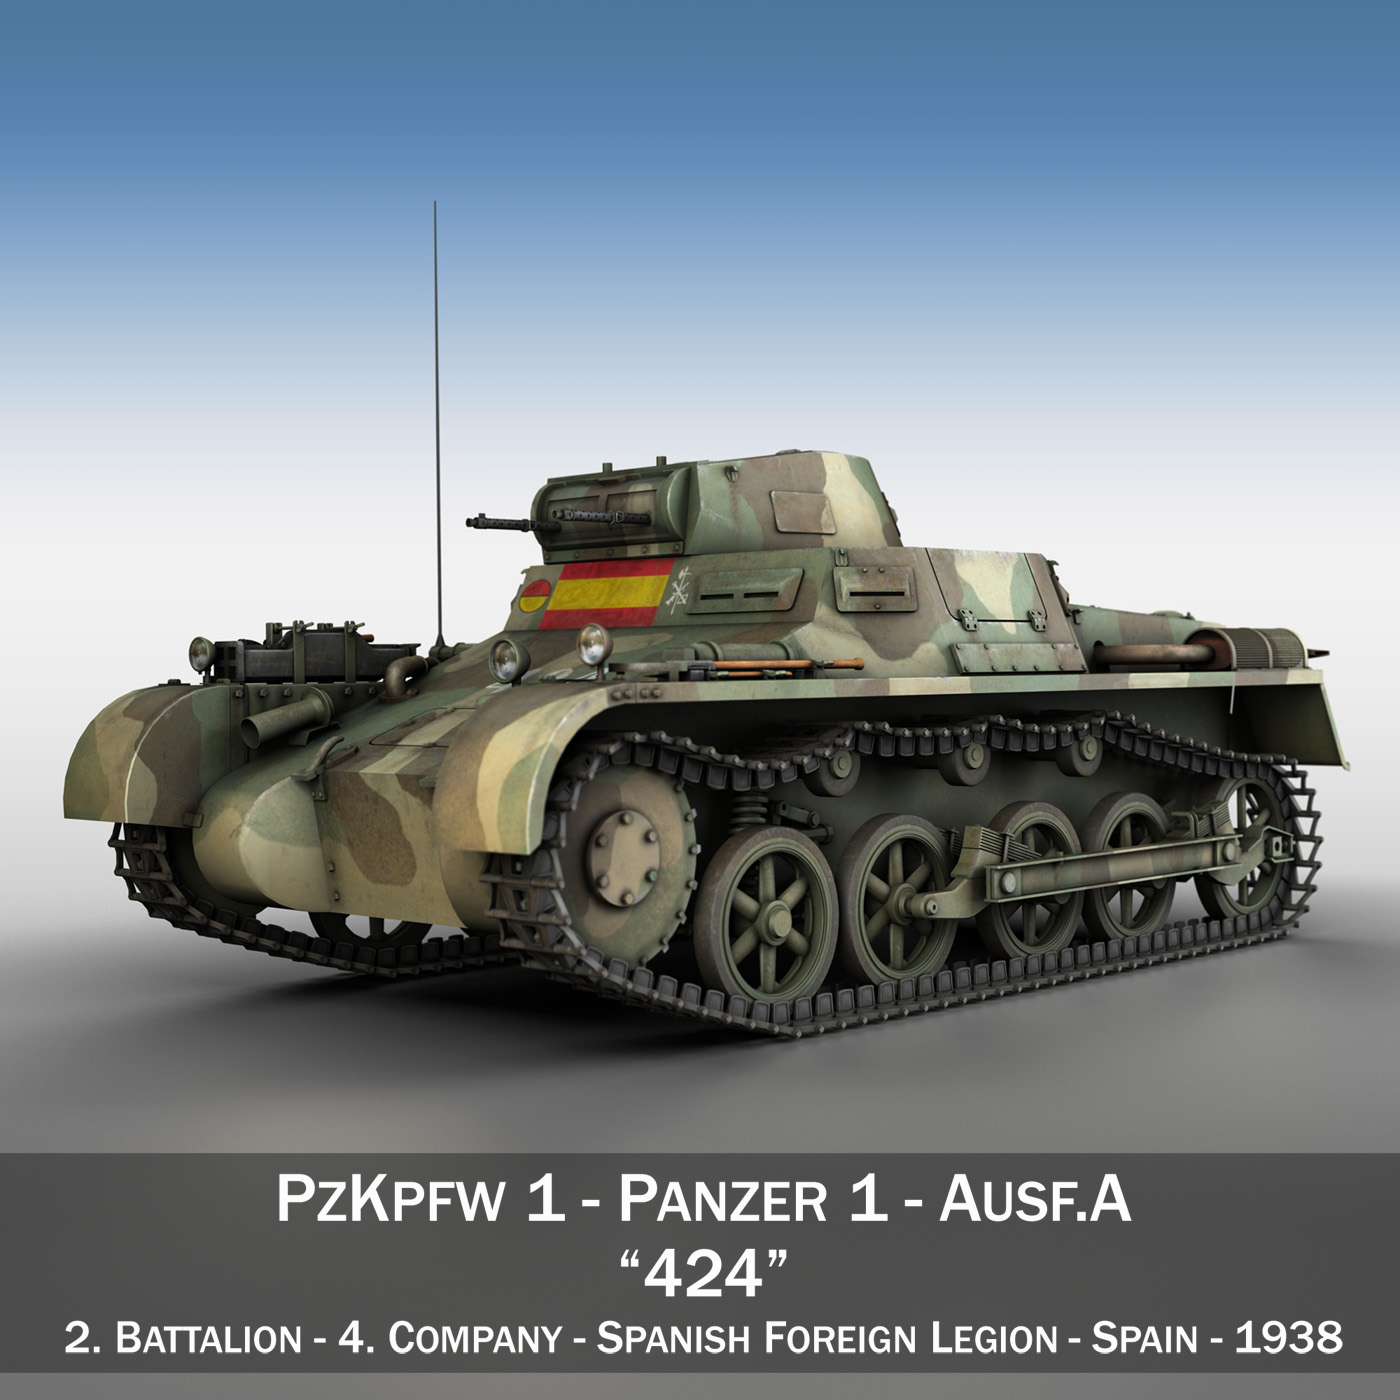 PzKpfw 1 - Panzer 1 - Ausf. A - 424 3d model  266646